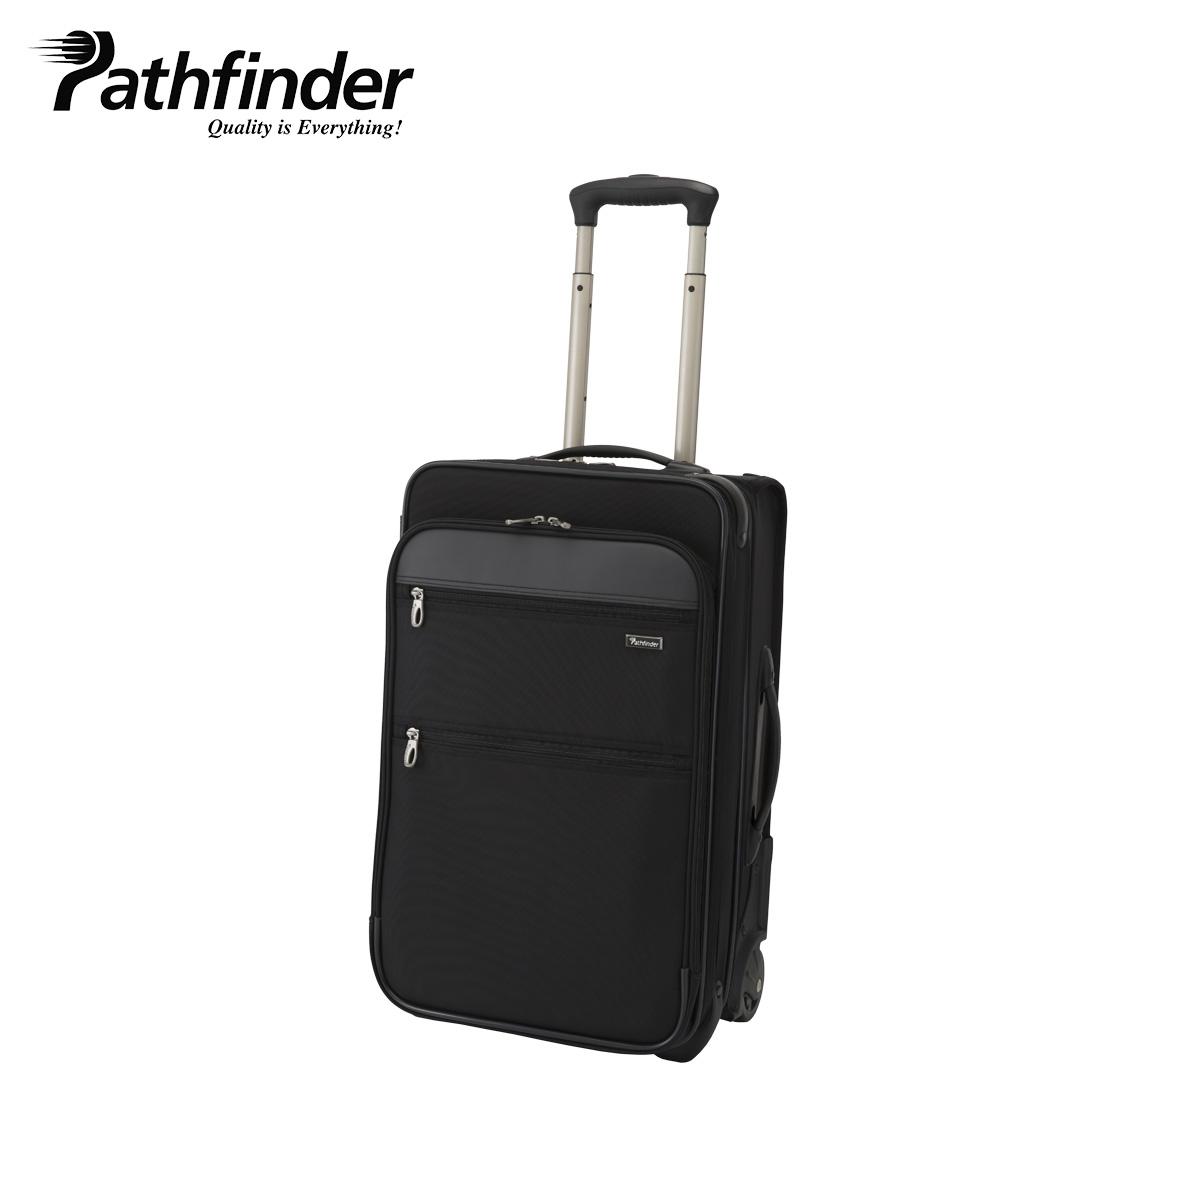 Pathfinder REVOLUTION XT パスファインダー バッグ キャリーケース キャリーバッグ スーツケース 37L-53L メンズ 機内持ち込み ソフト 拡張 ブラック 黒 PF6822DAXB